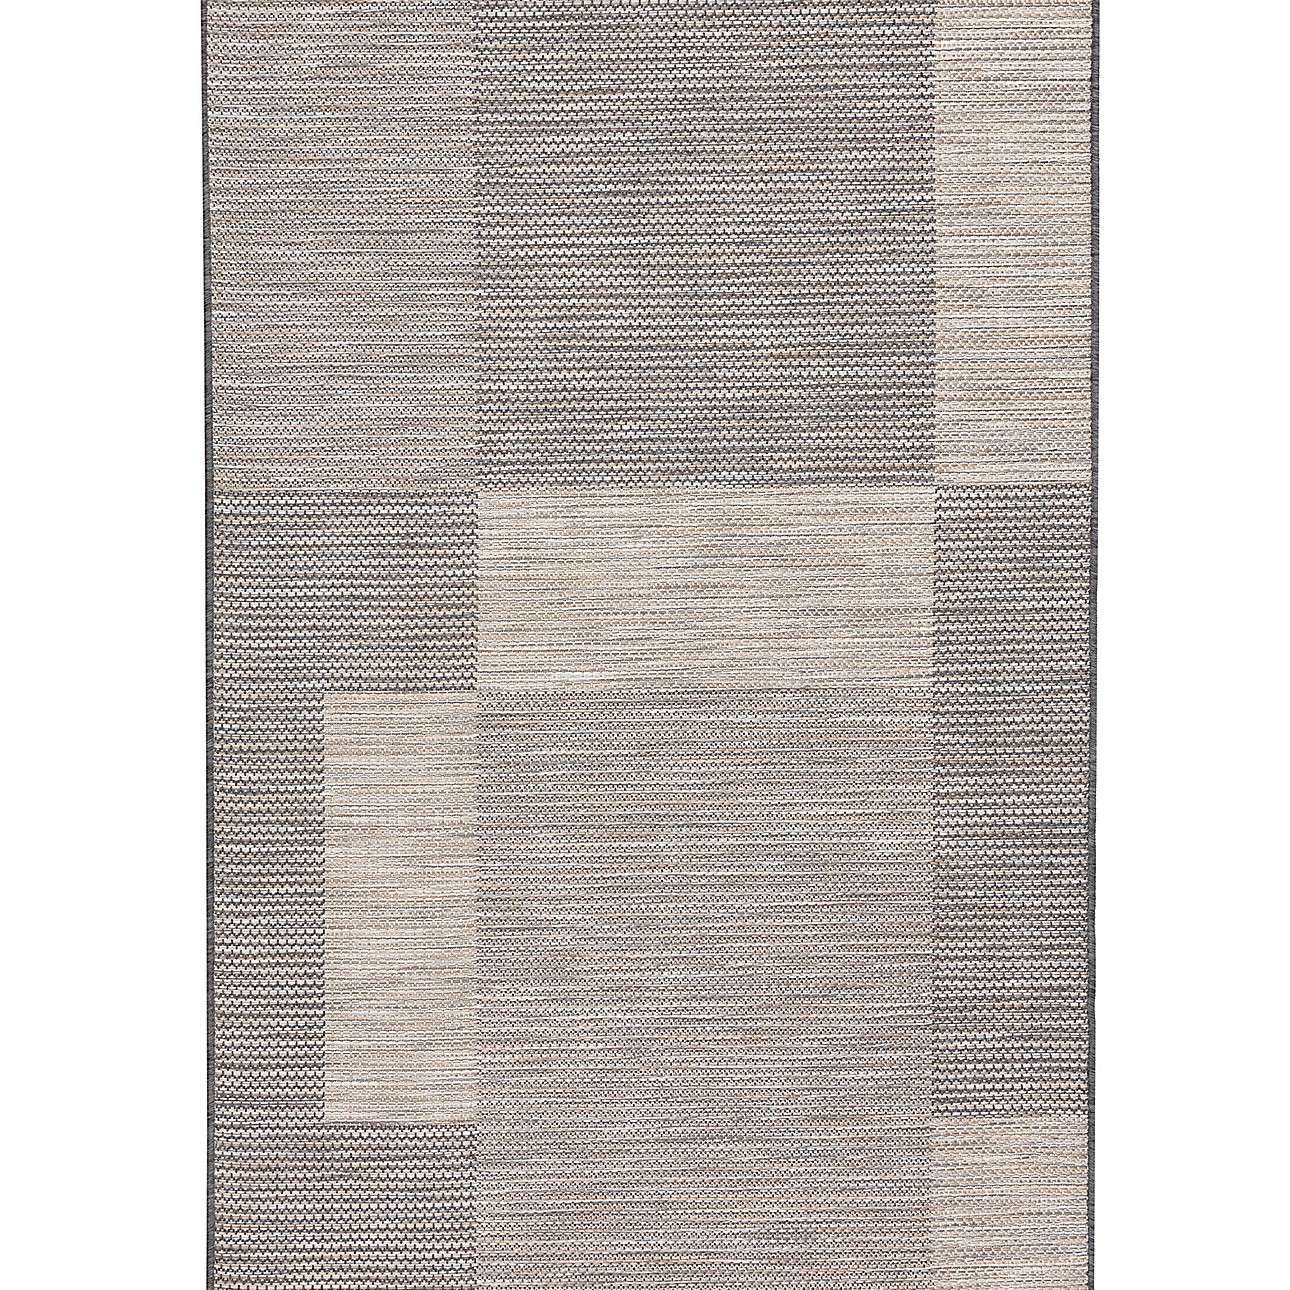 Dywan Breeze anthracite/cliff grey 120x170cm